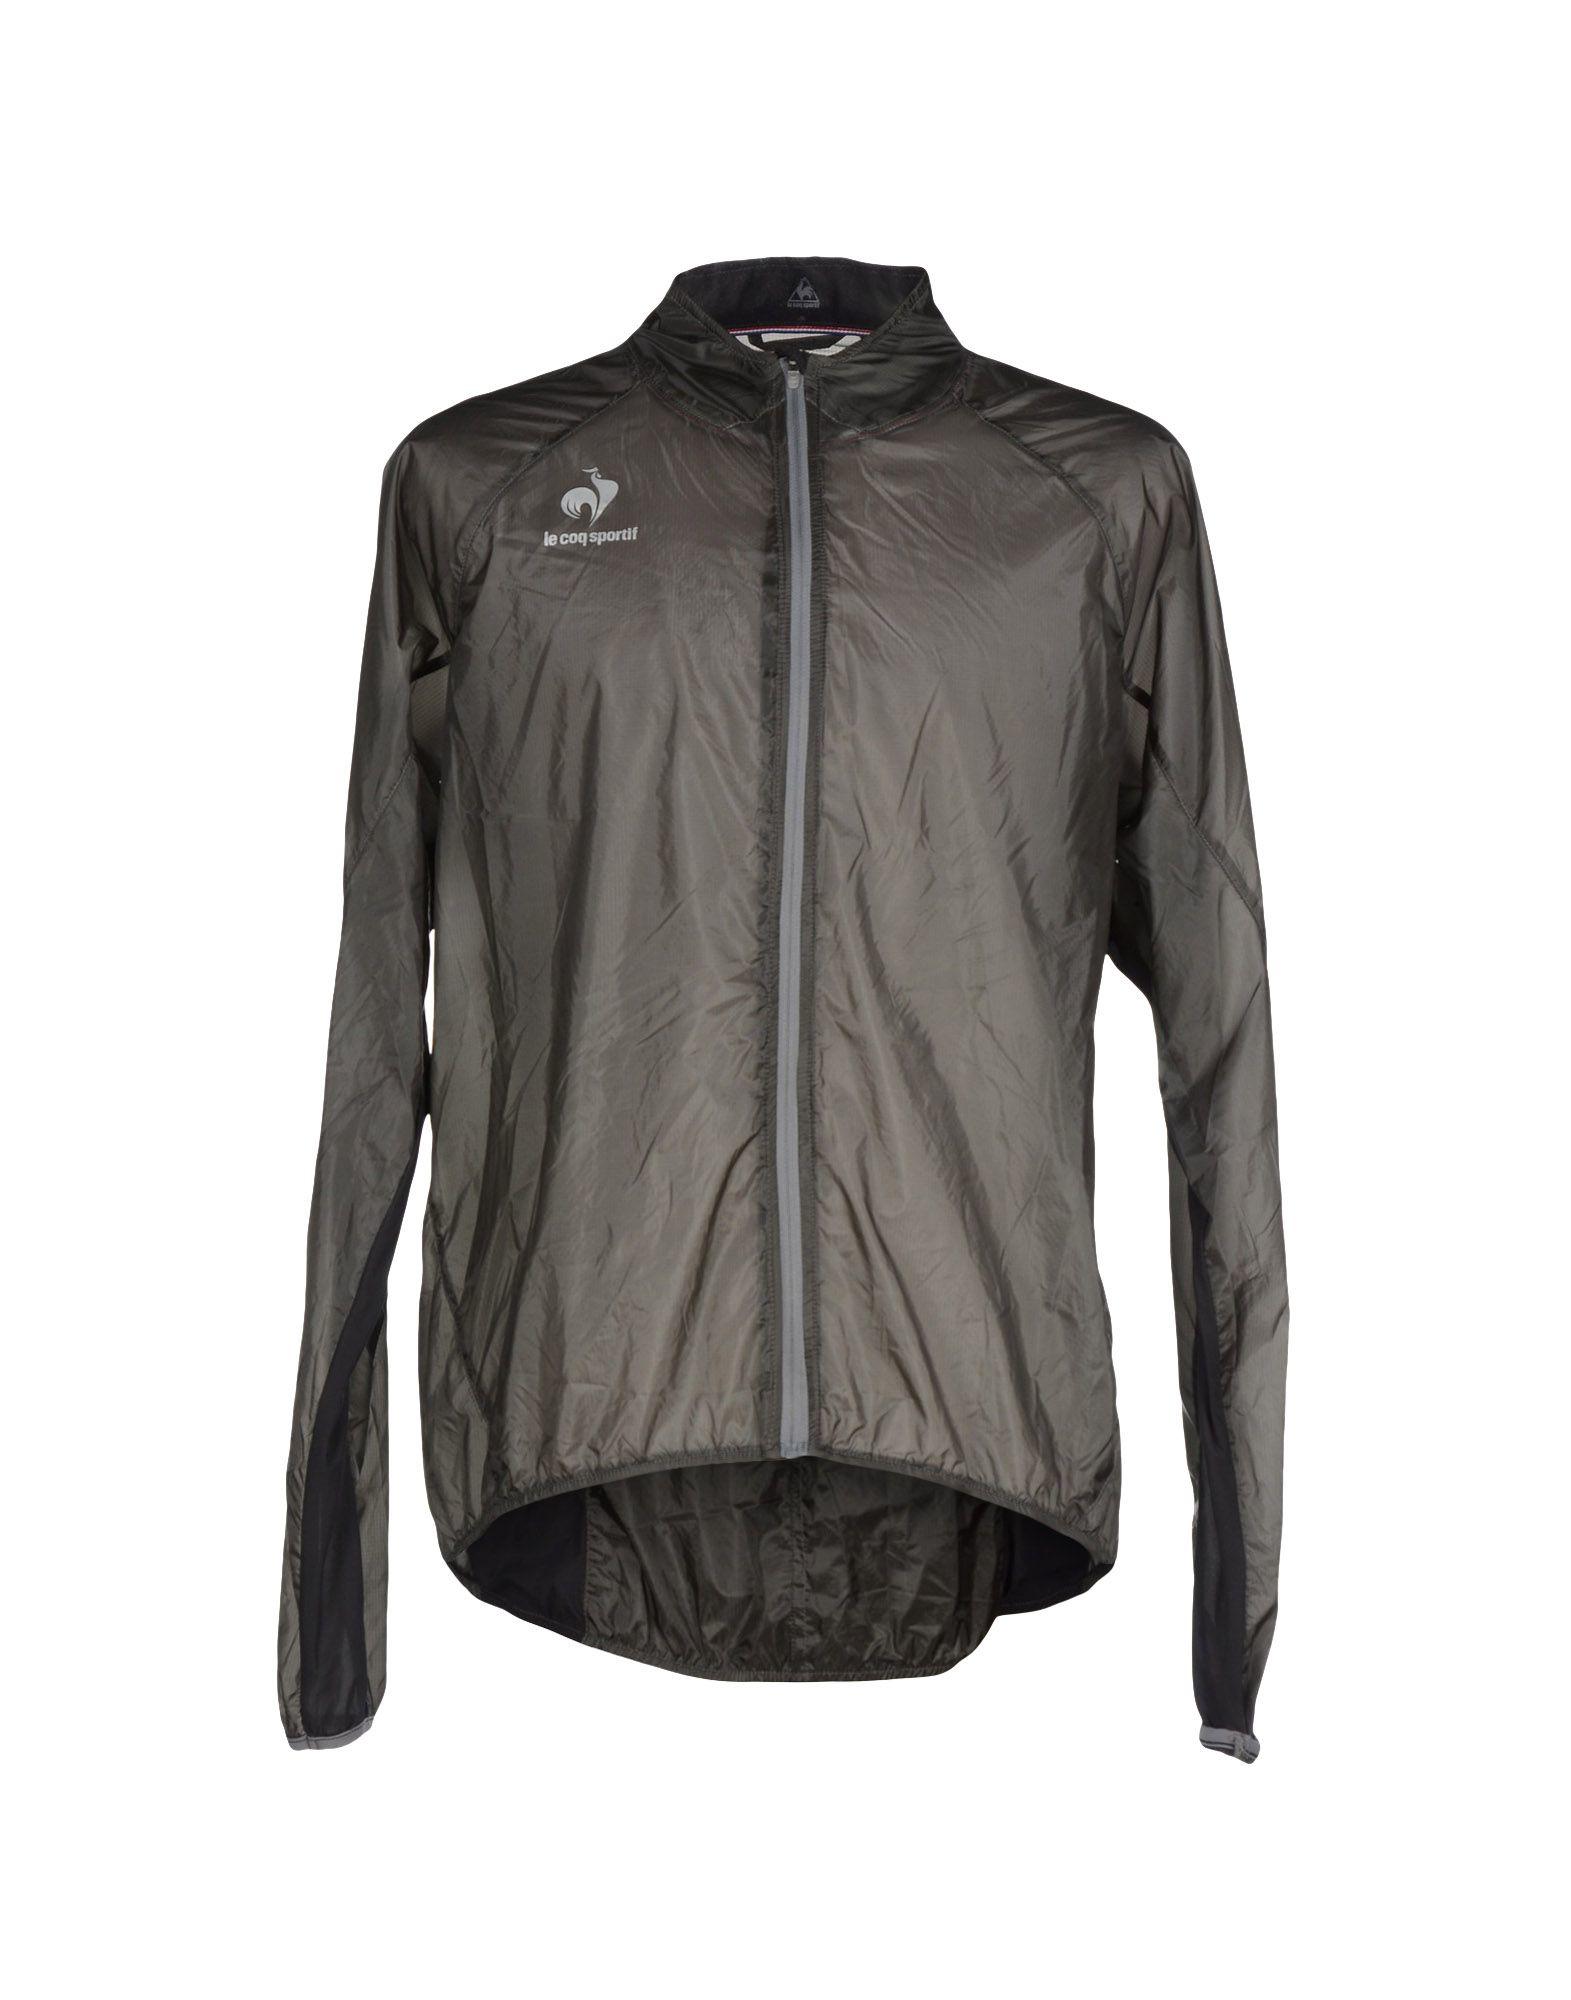 le coq sportif jacket in gray for men lyst. Black Bedroom Furniture Sets. Home Design Ideas